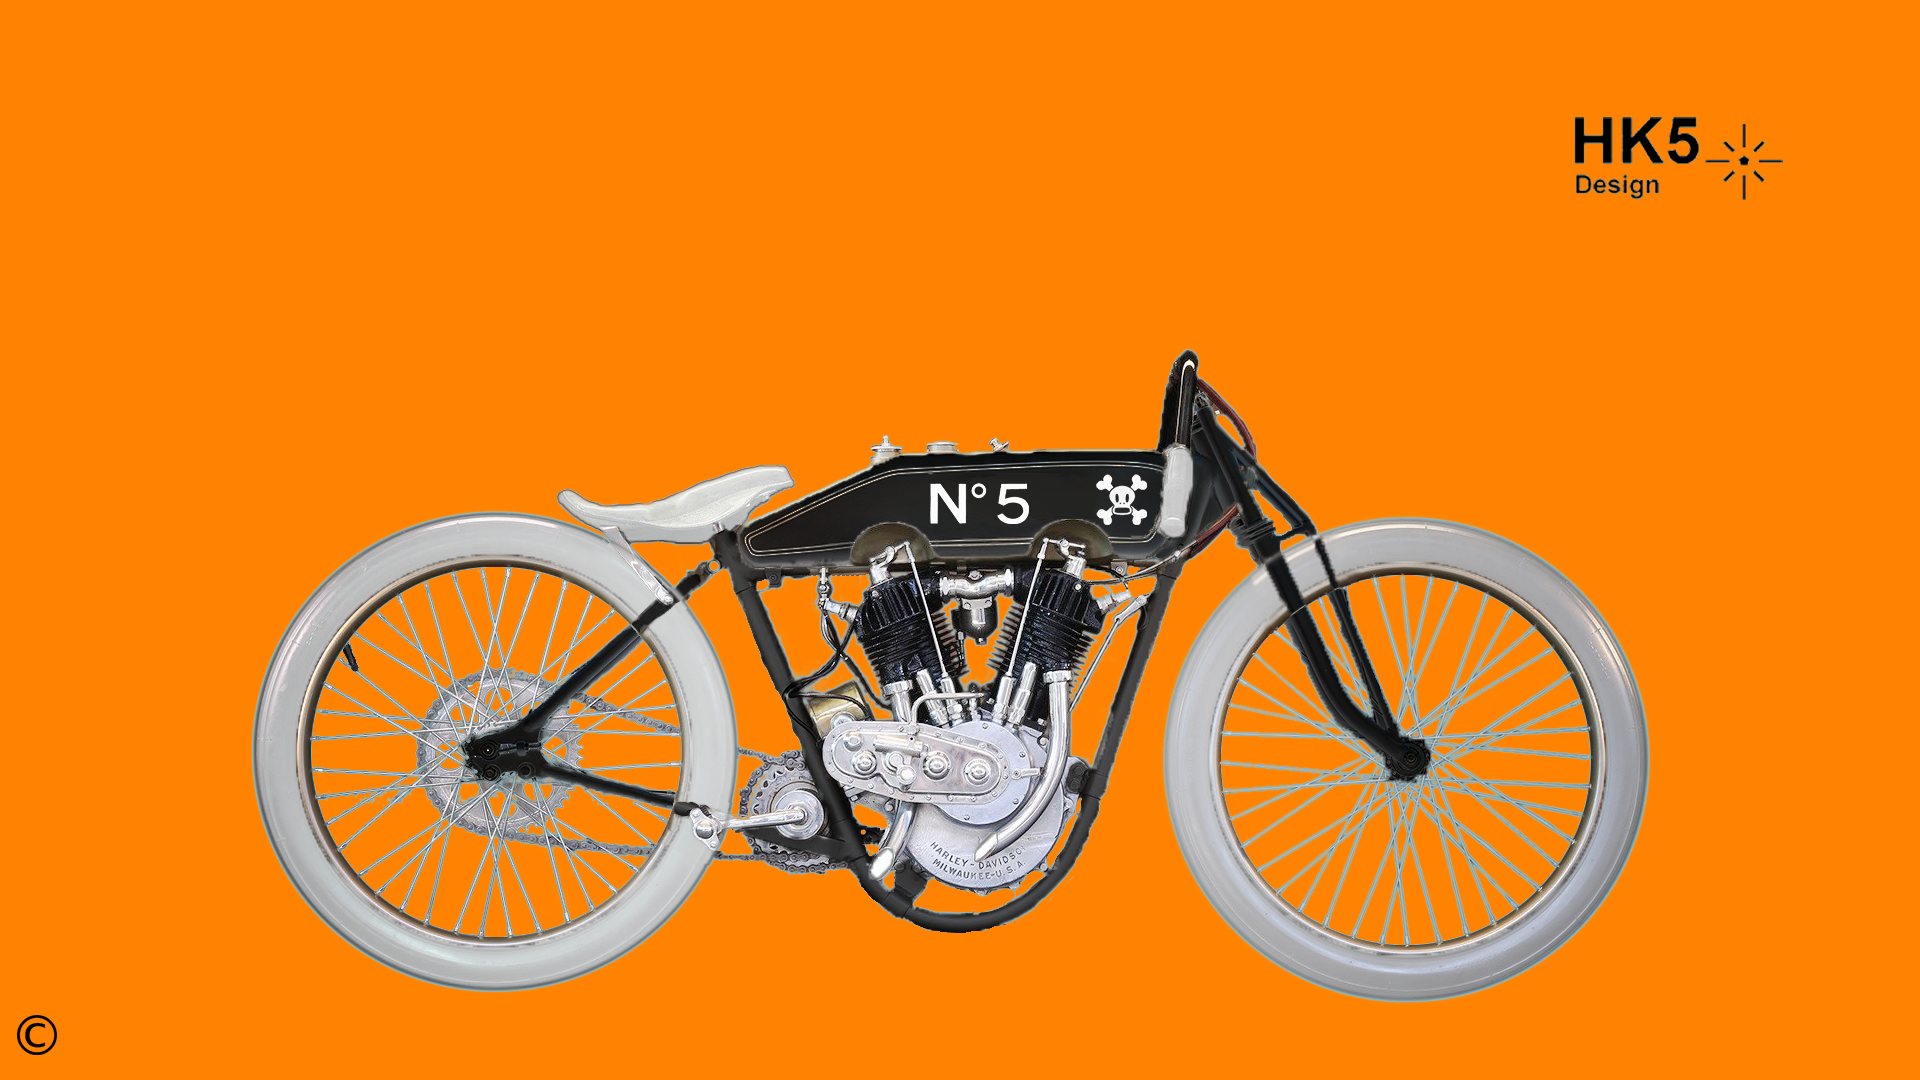 harley_orange.png